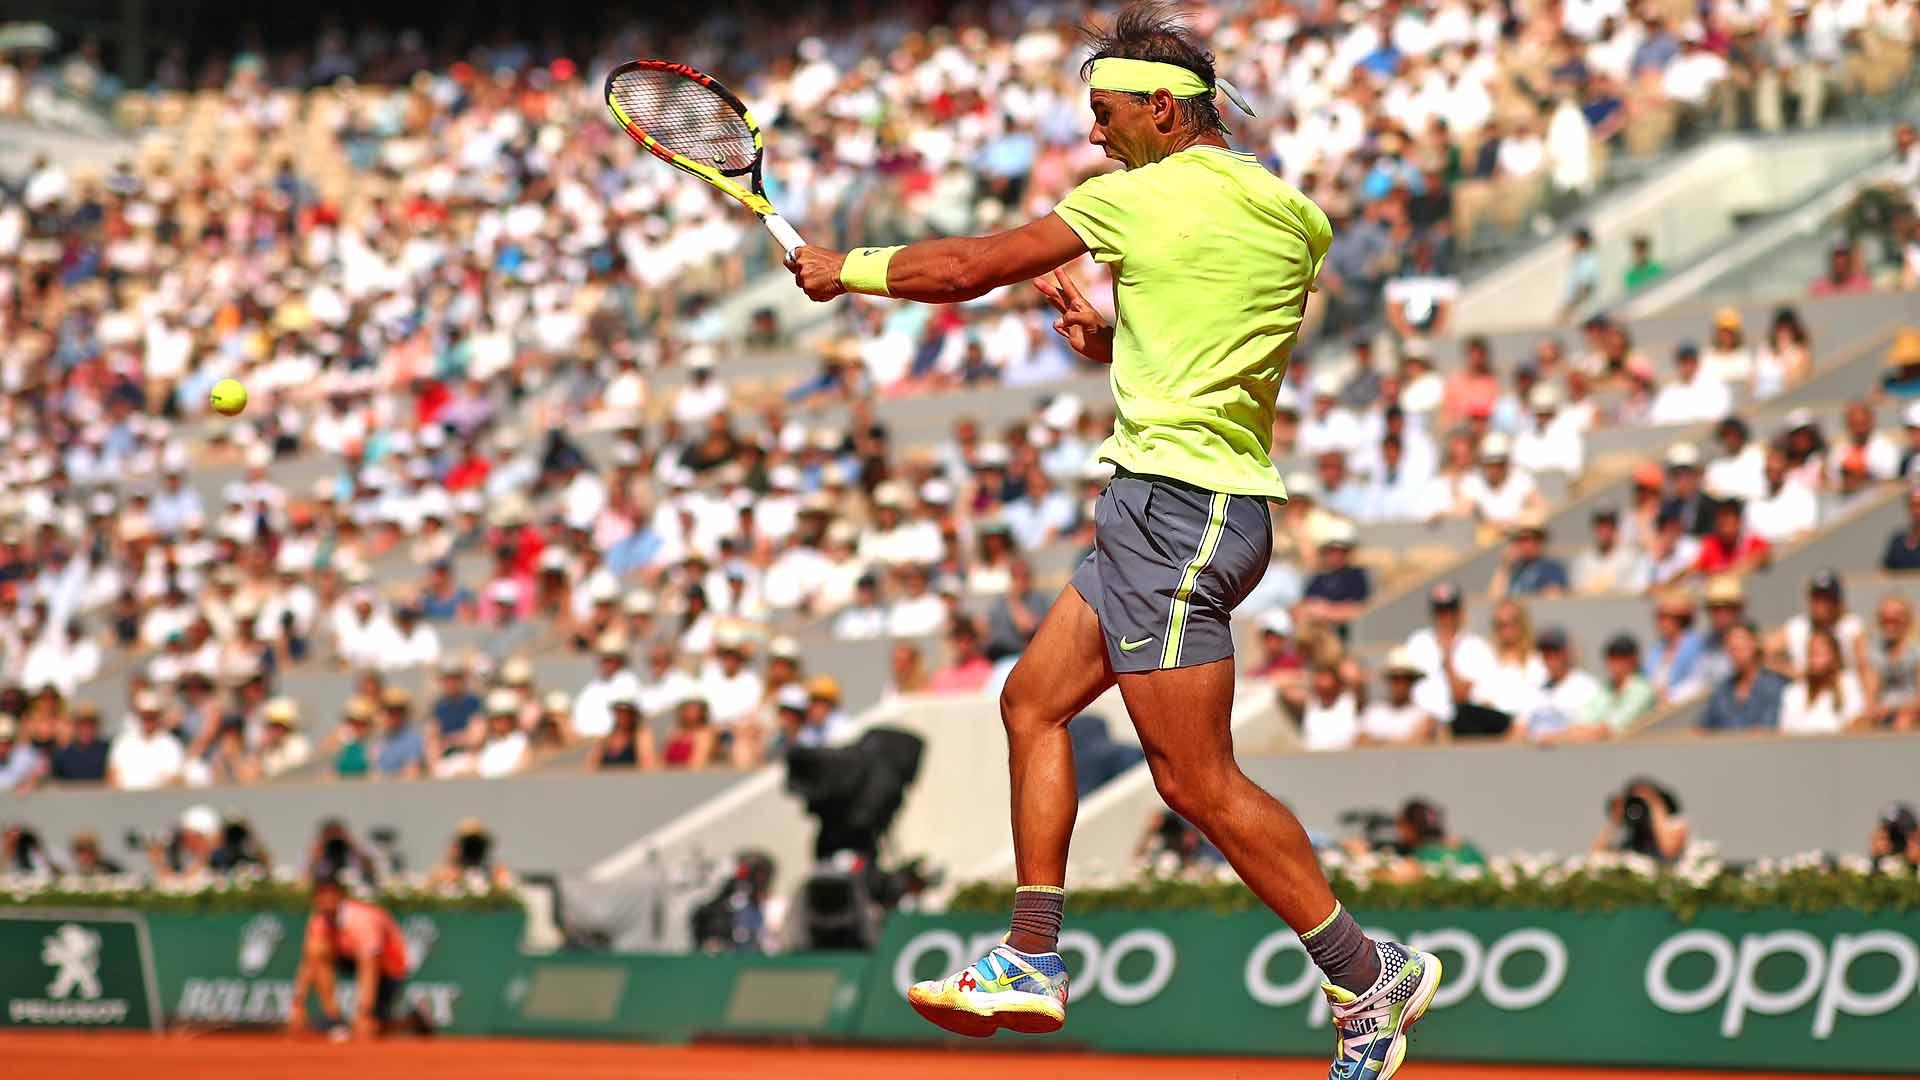 Rafael Nadal Cruises Into 13th Roland Garros Quarter Final Atp Tour Tennis